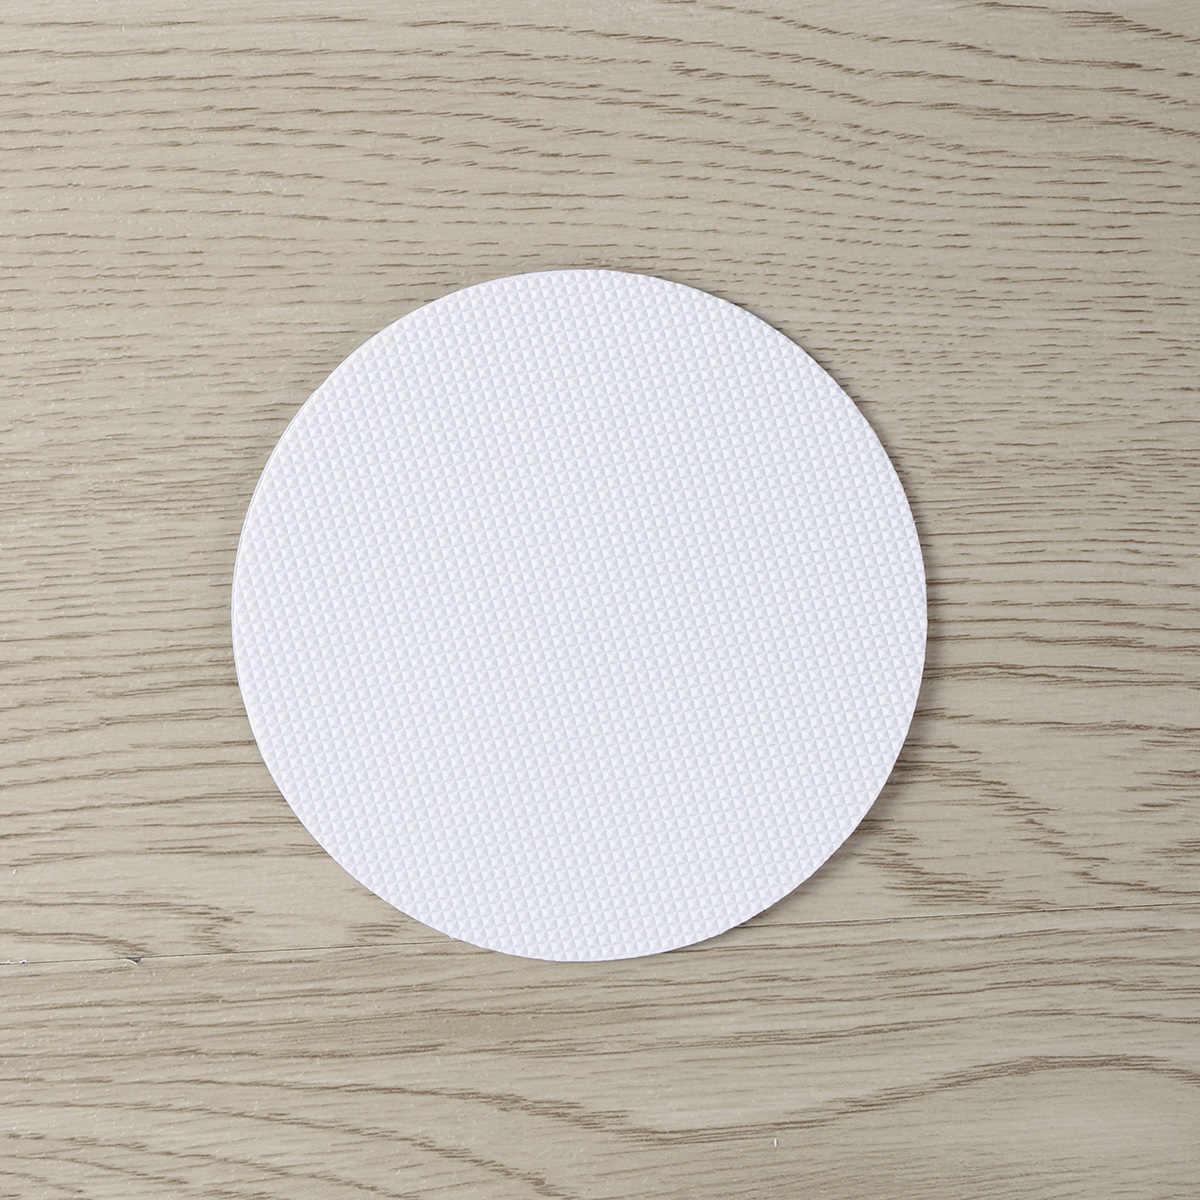 40 PCS Non-Slip Cakram Safety Bak Mandi Shower Stiker PEVA Perekat Cakram Tidak Beracun Anti Bakteri Mat untuk Bak Mandi Shower A30